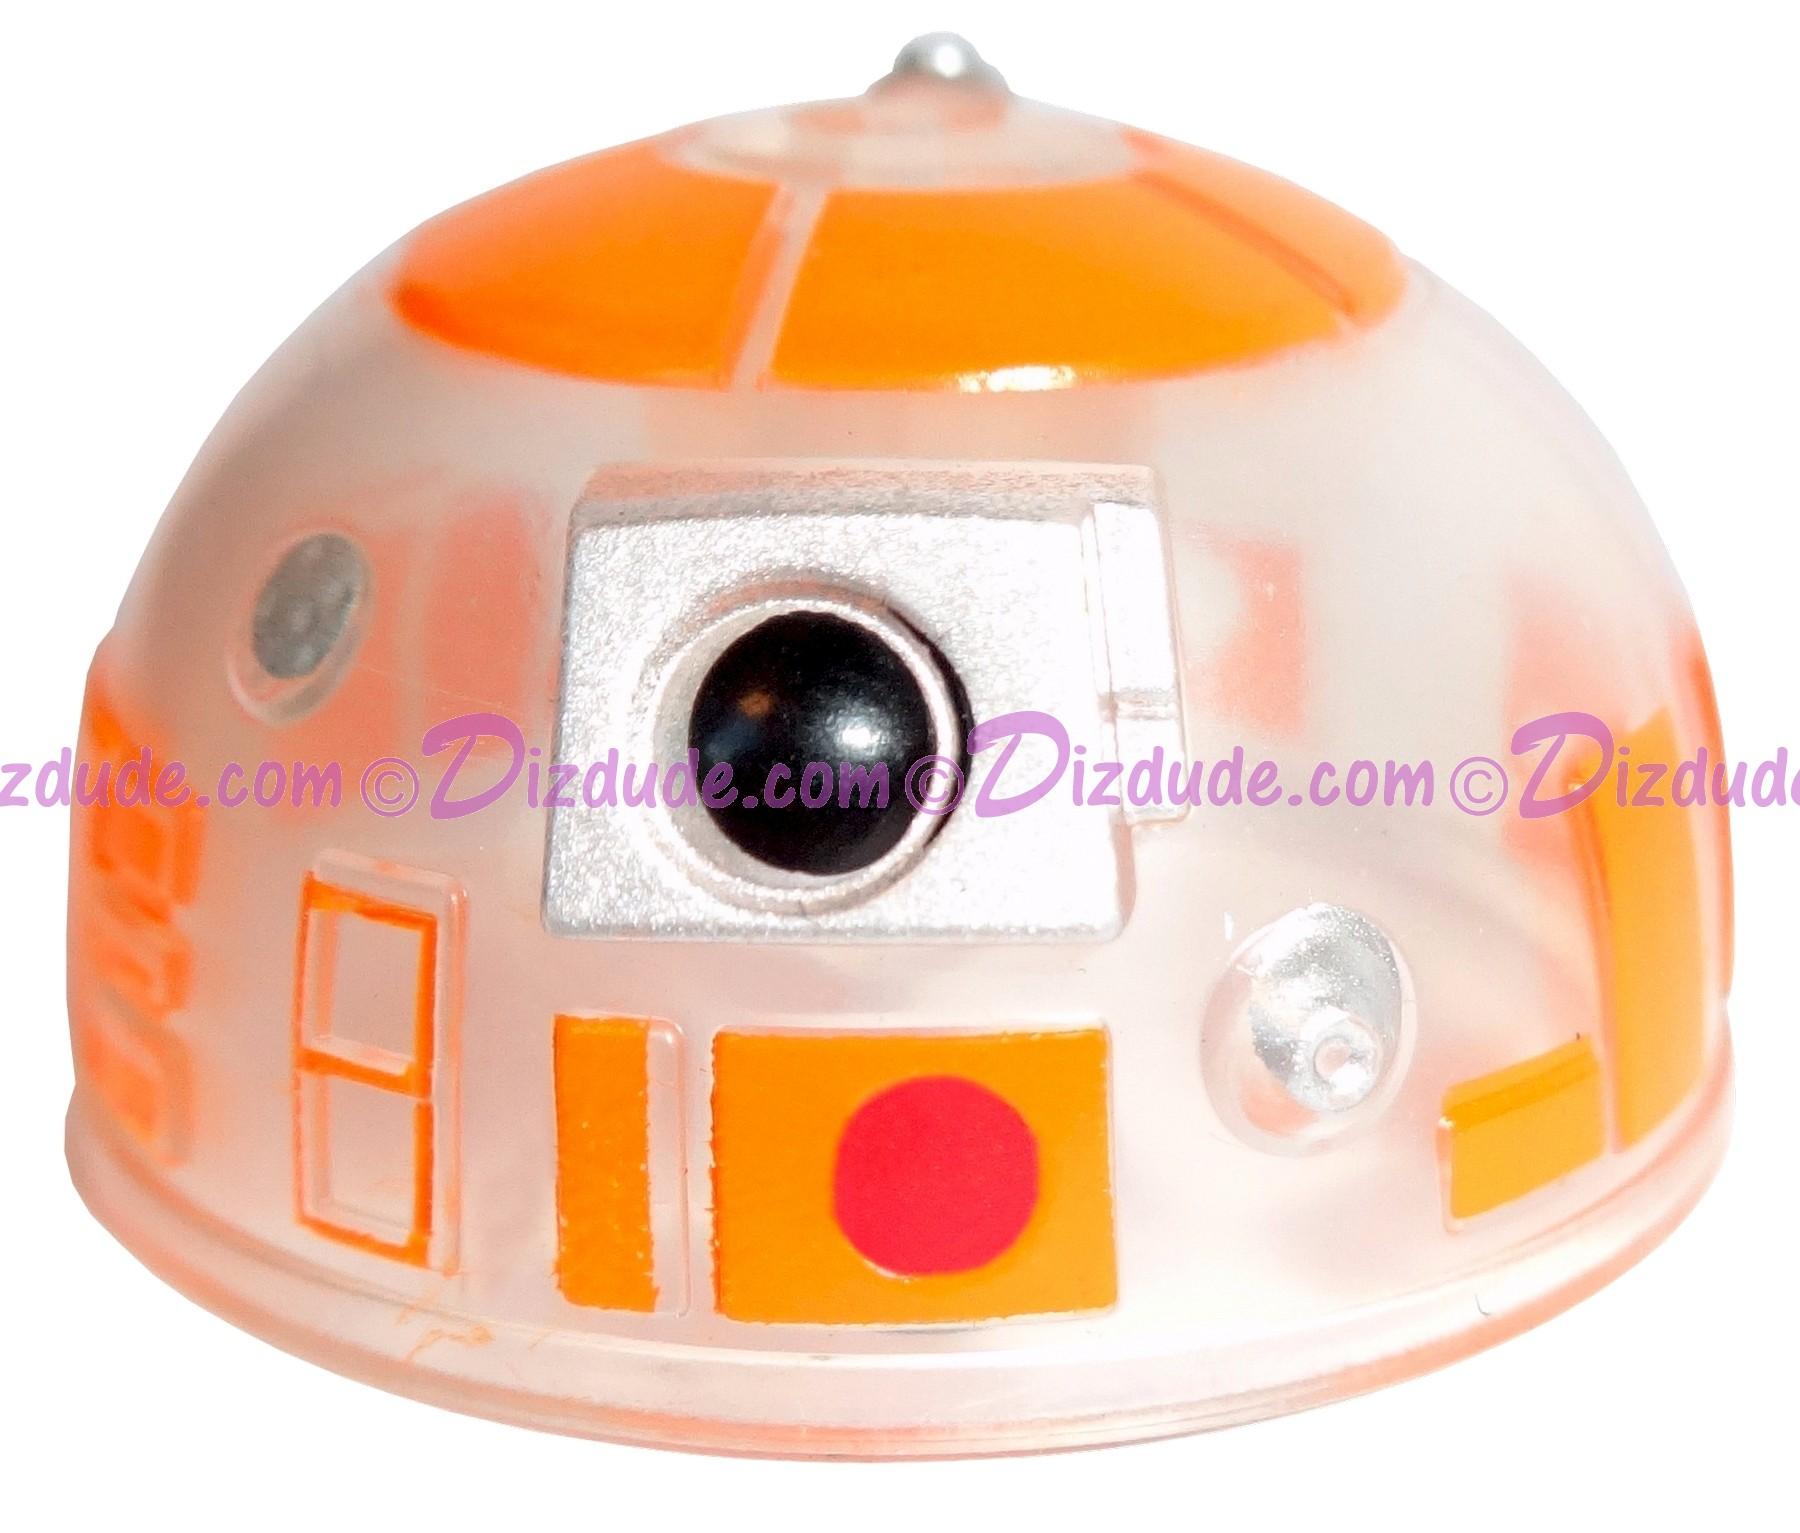 R3 Clear Orange Astromech Droid Dome ~ Series 2 from Disney Star Wars Build-A-Droid Factory © Dizdude.com